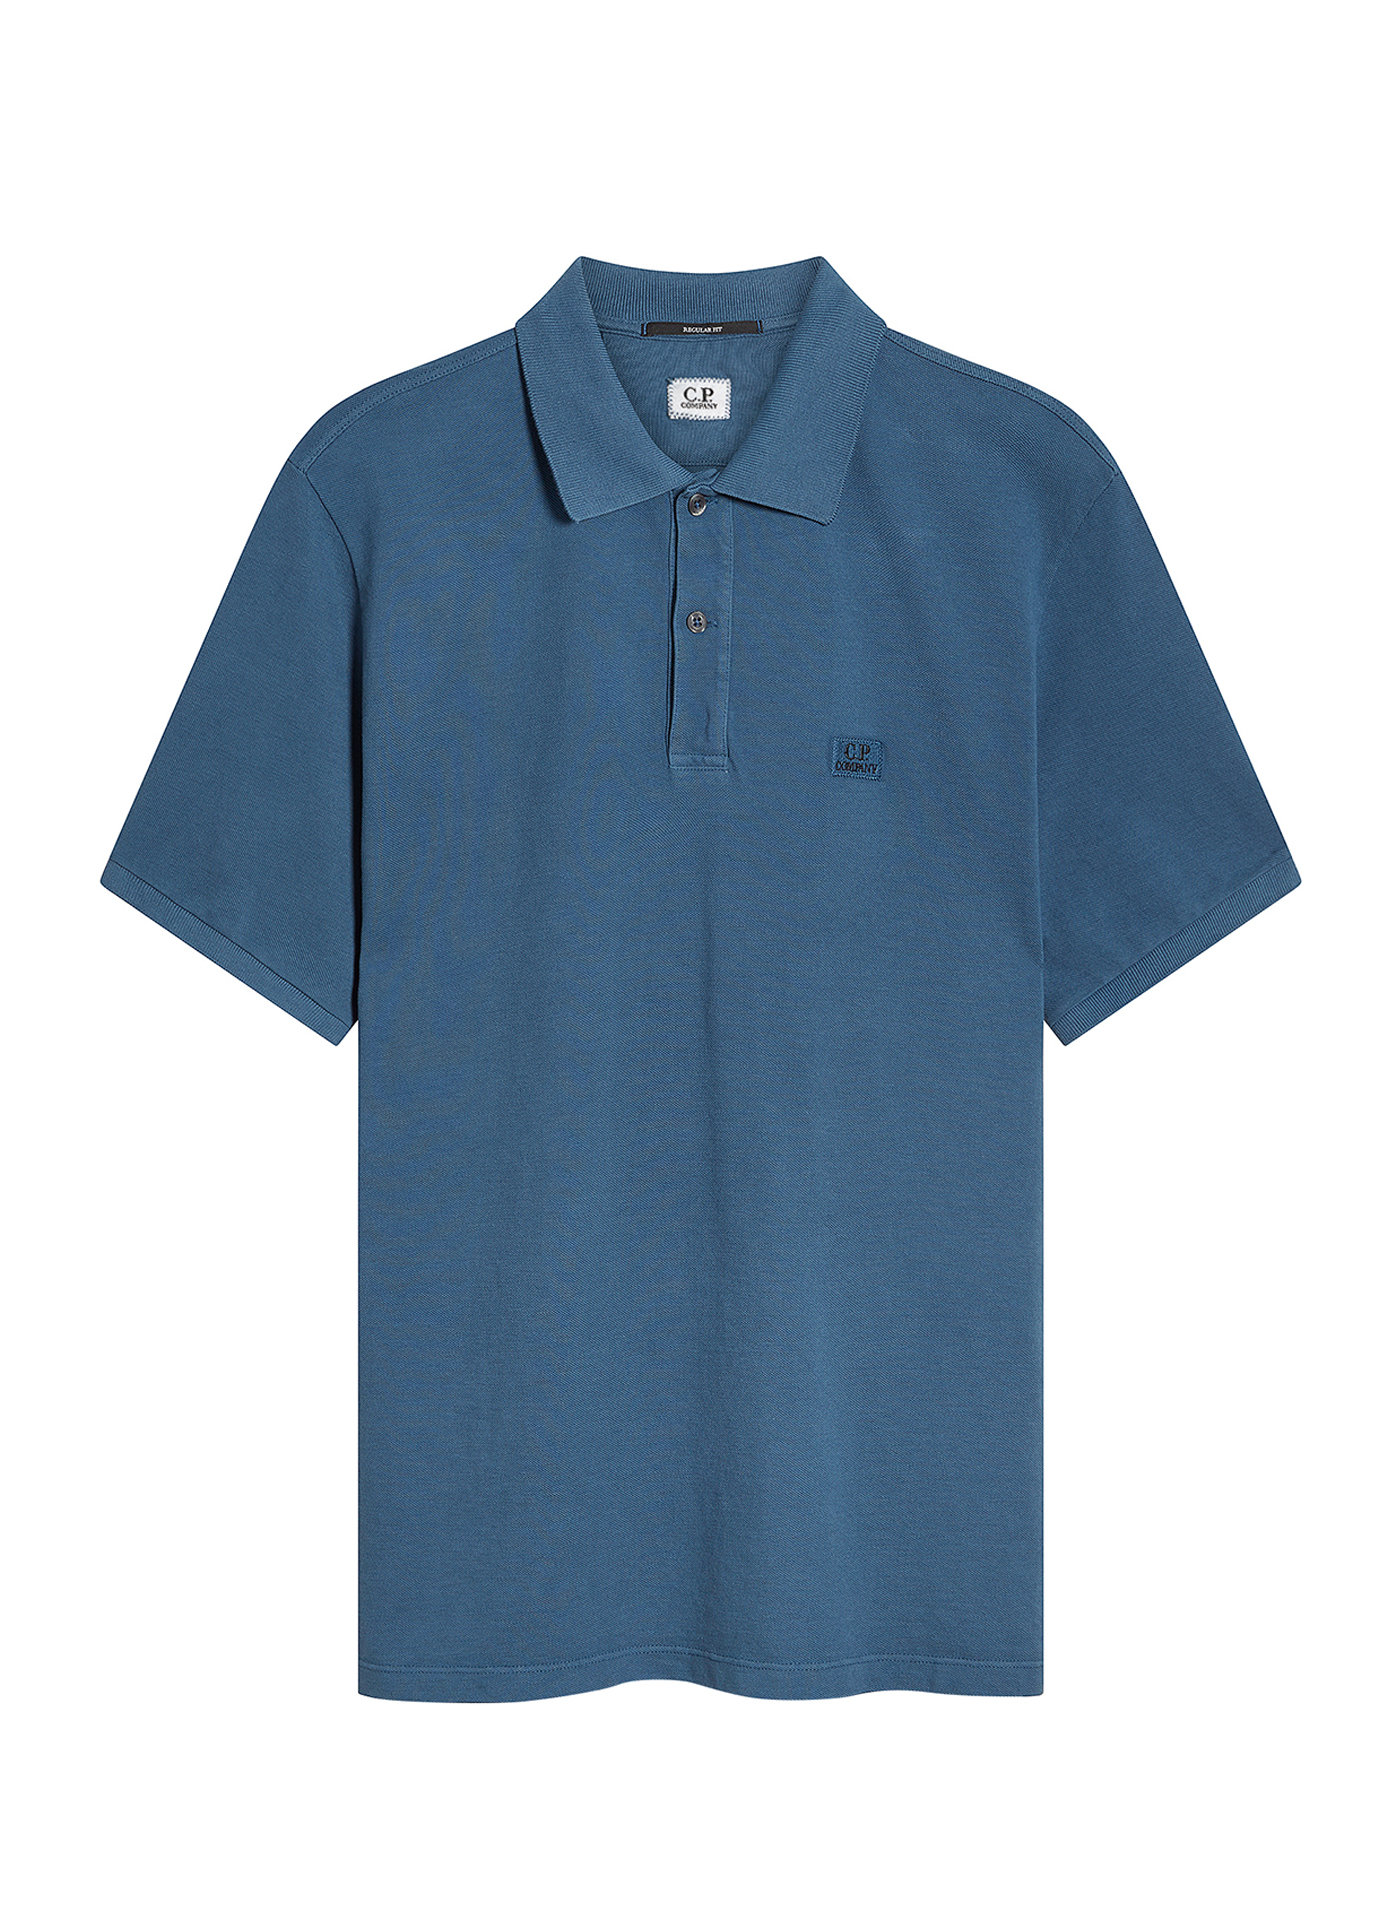 light navy C.P. polo shirt on white background